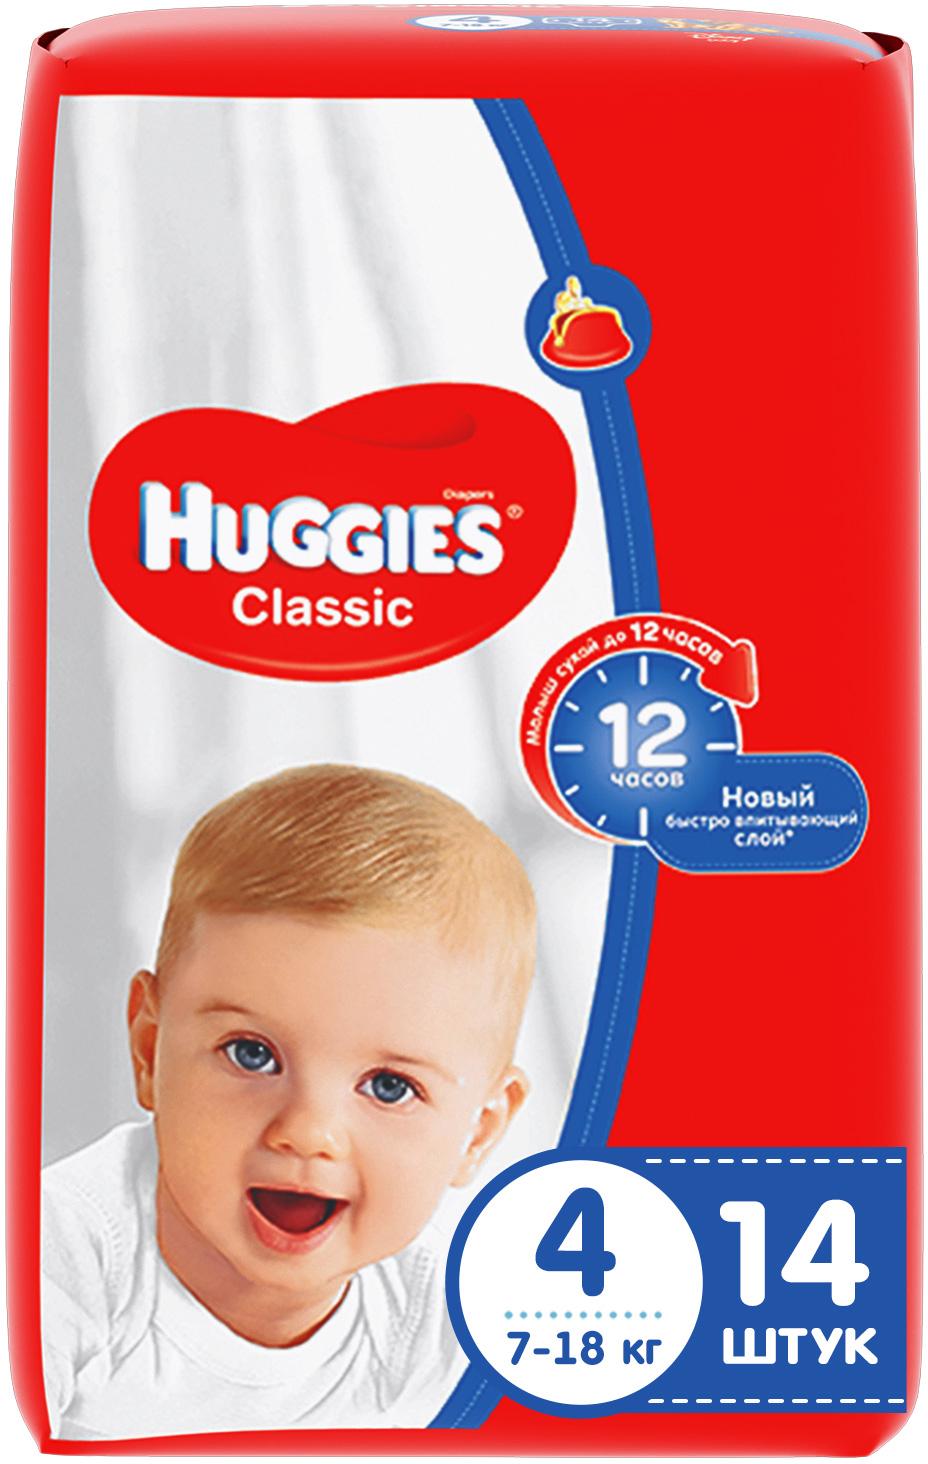 Huggies Подгузники Classic 7-18 кг (размер 4) 14 шт